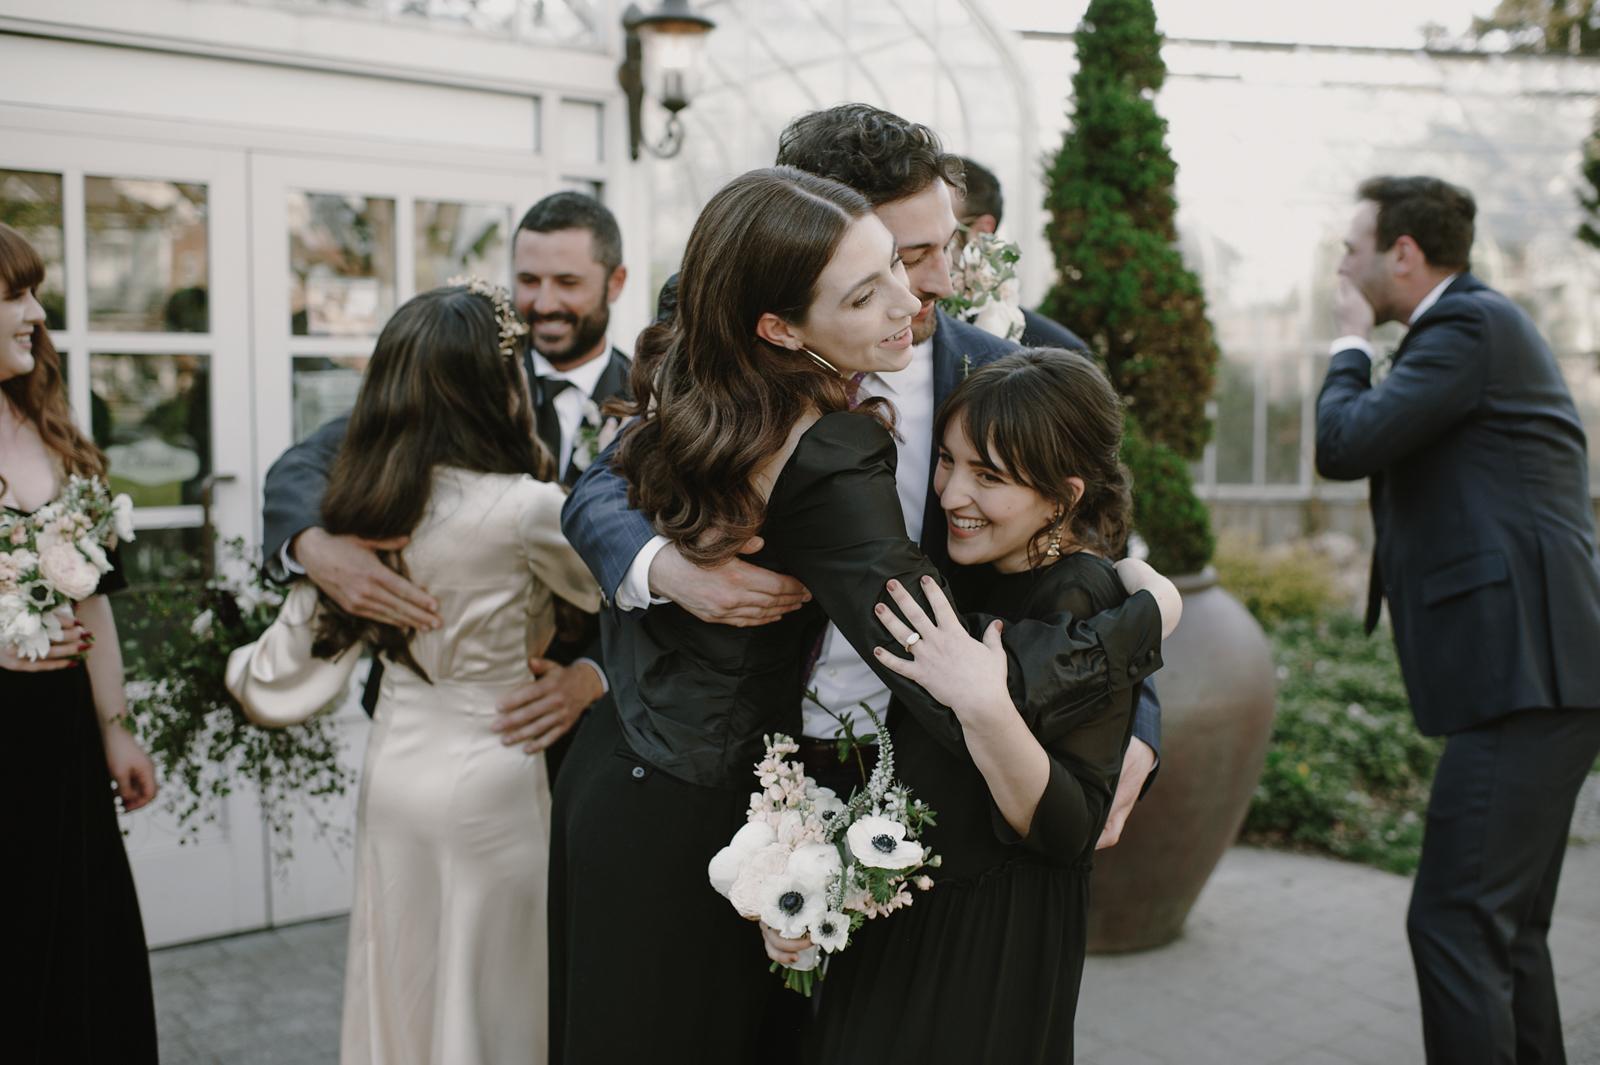 kristenmarieparker_tacoma_conservatory_warehouse_wedding053.JPG